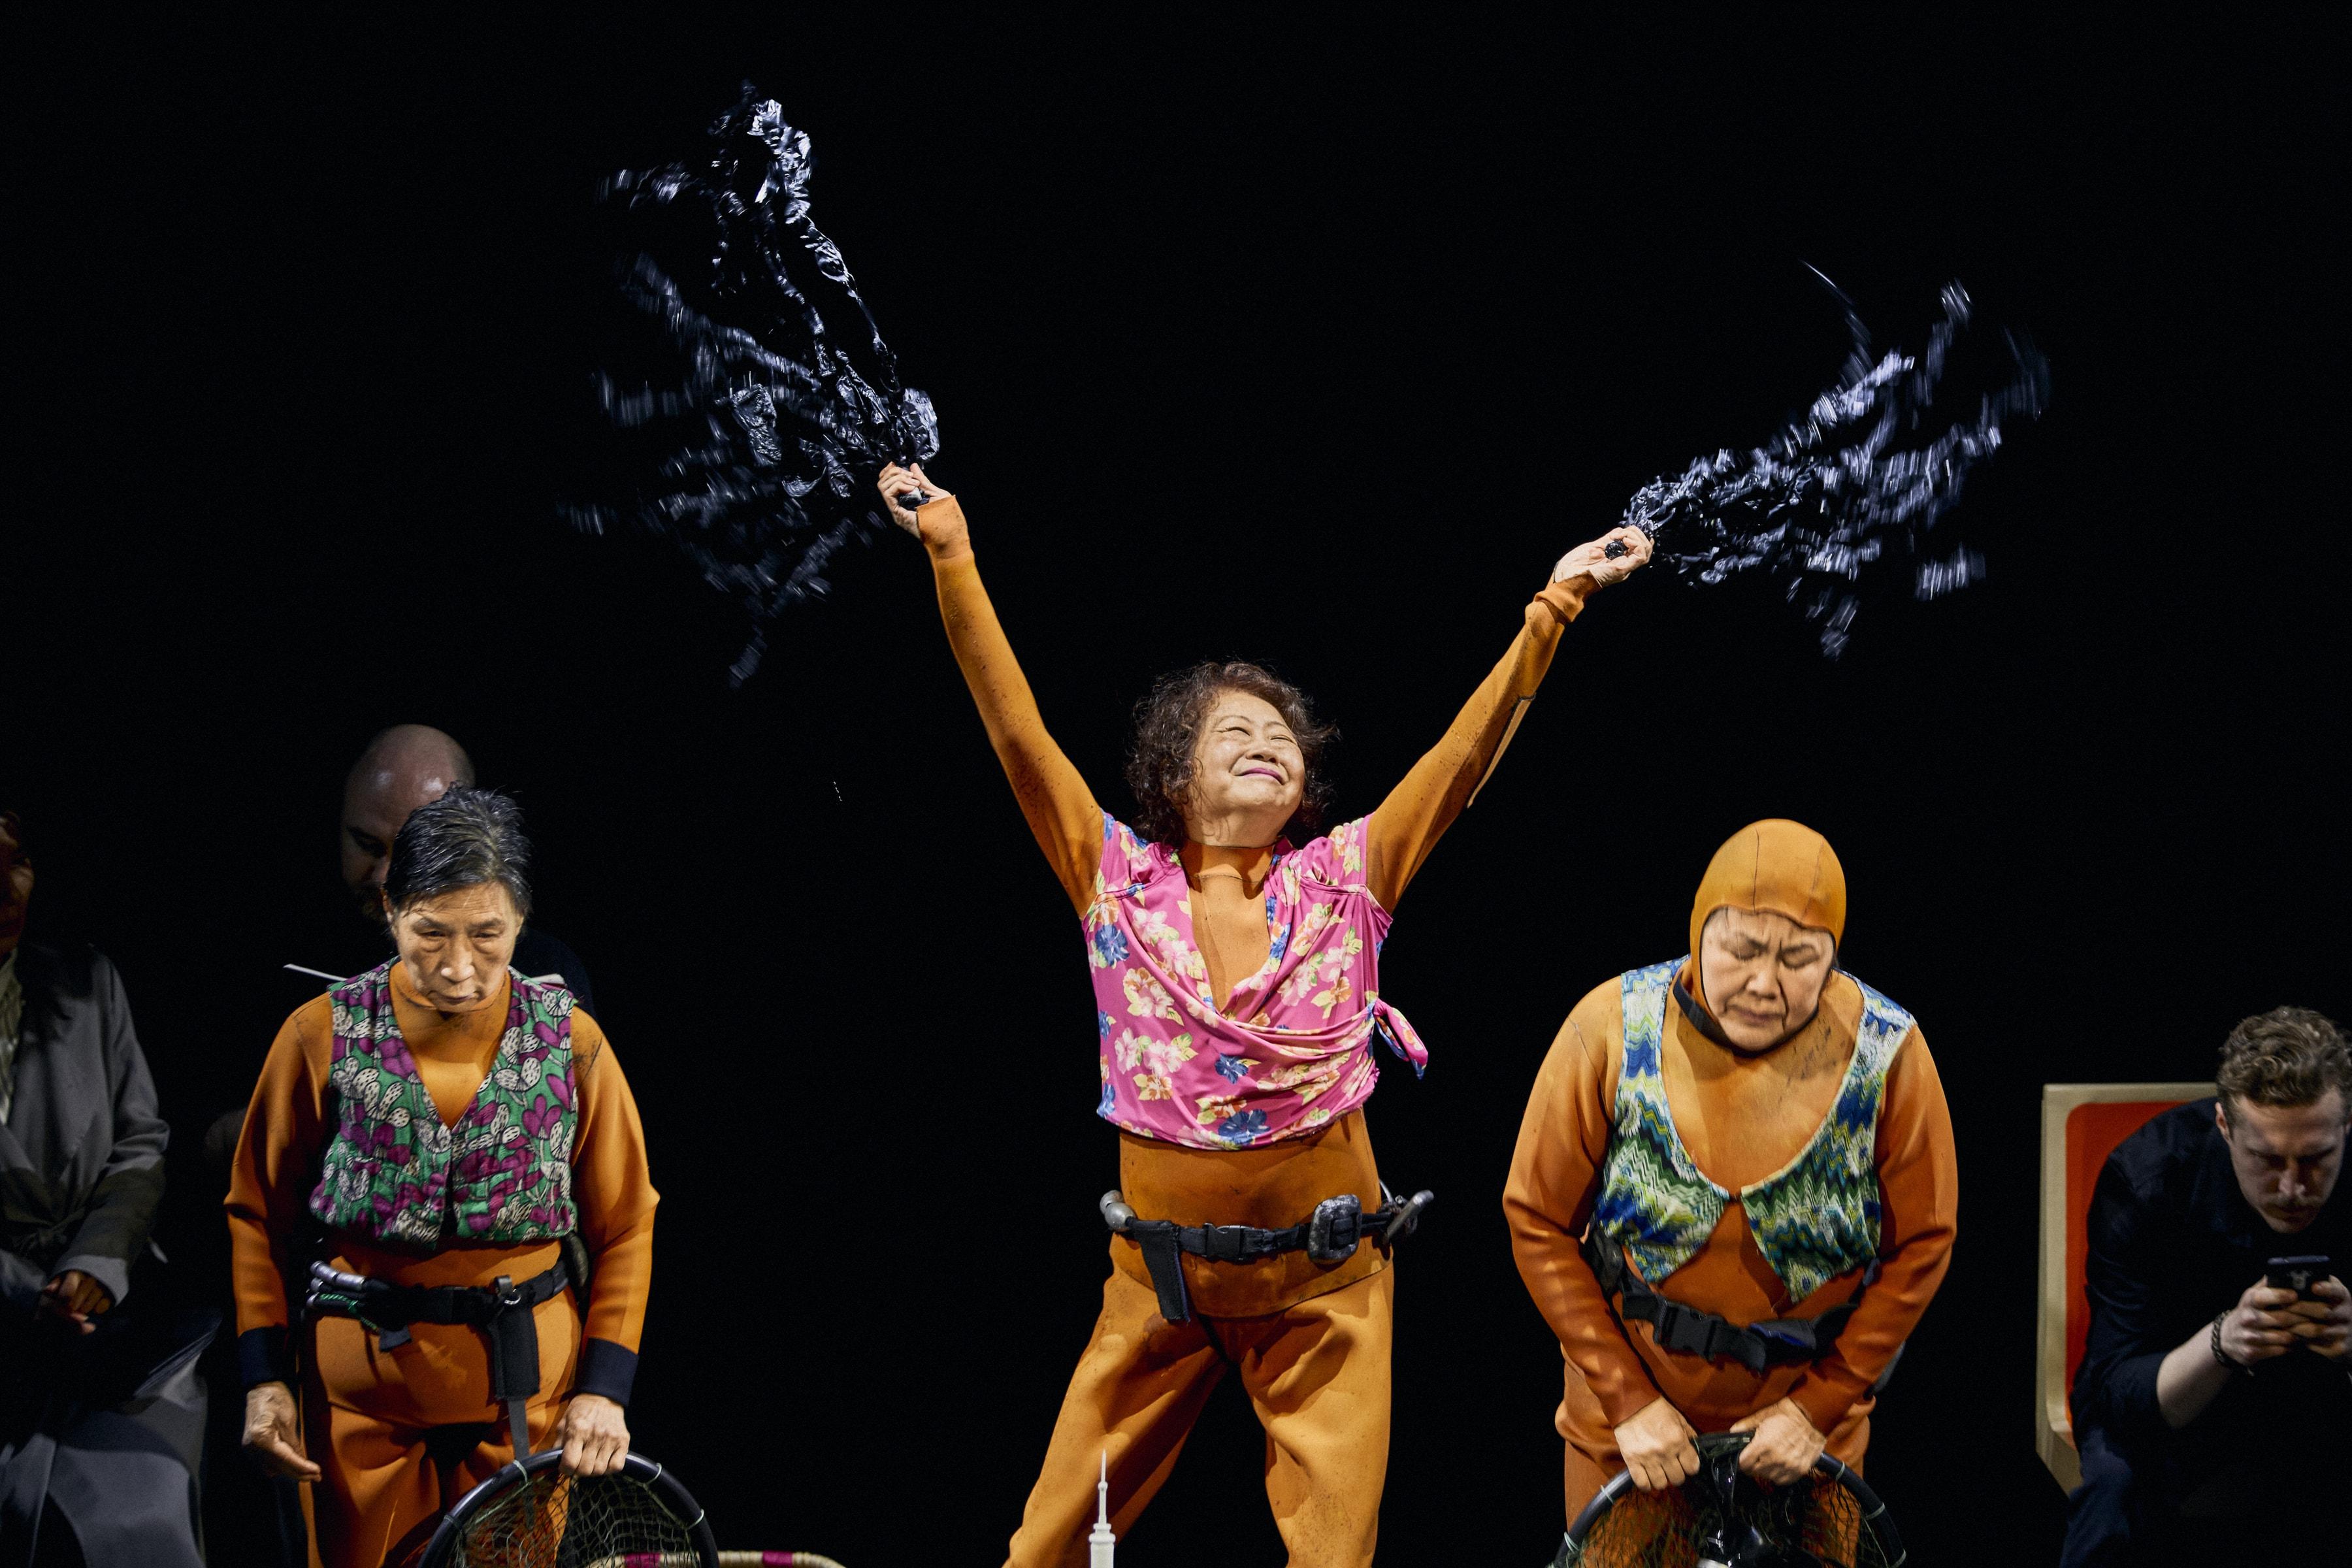 Wai Ching Ho, Jo Yang, and Emily Kuroda in <i>Endlings</i> at New York Theatre Workshop. Photo: Chad Batka